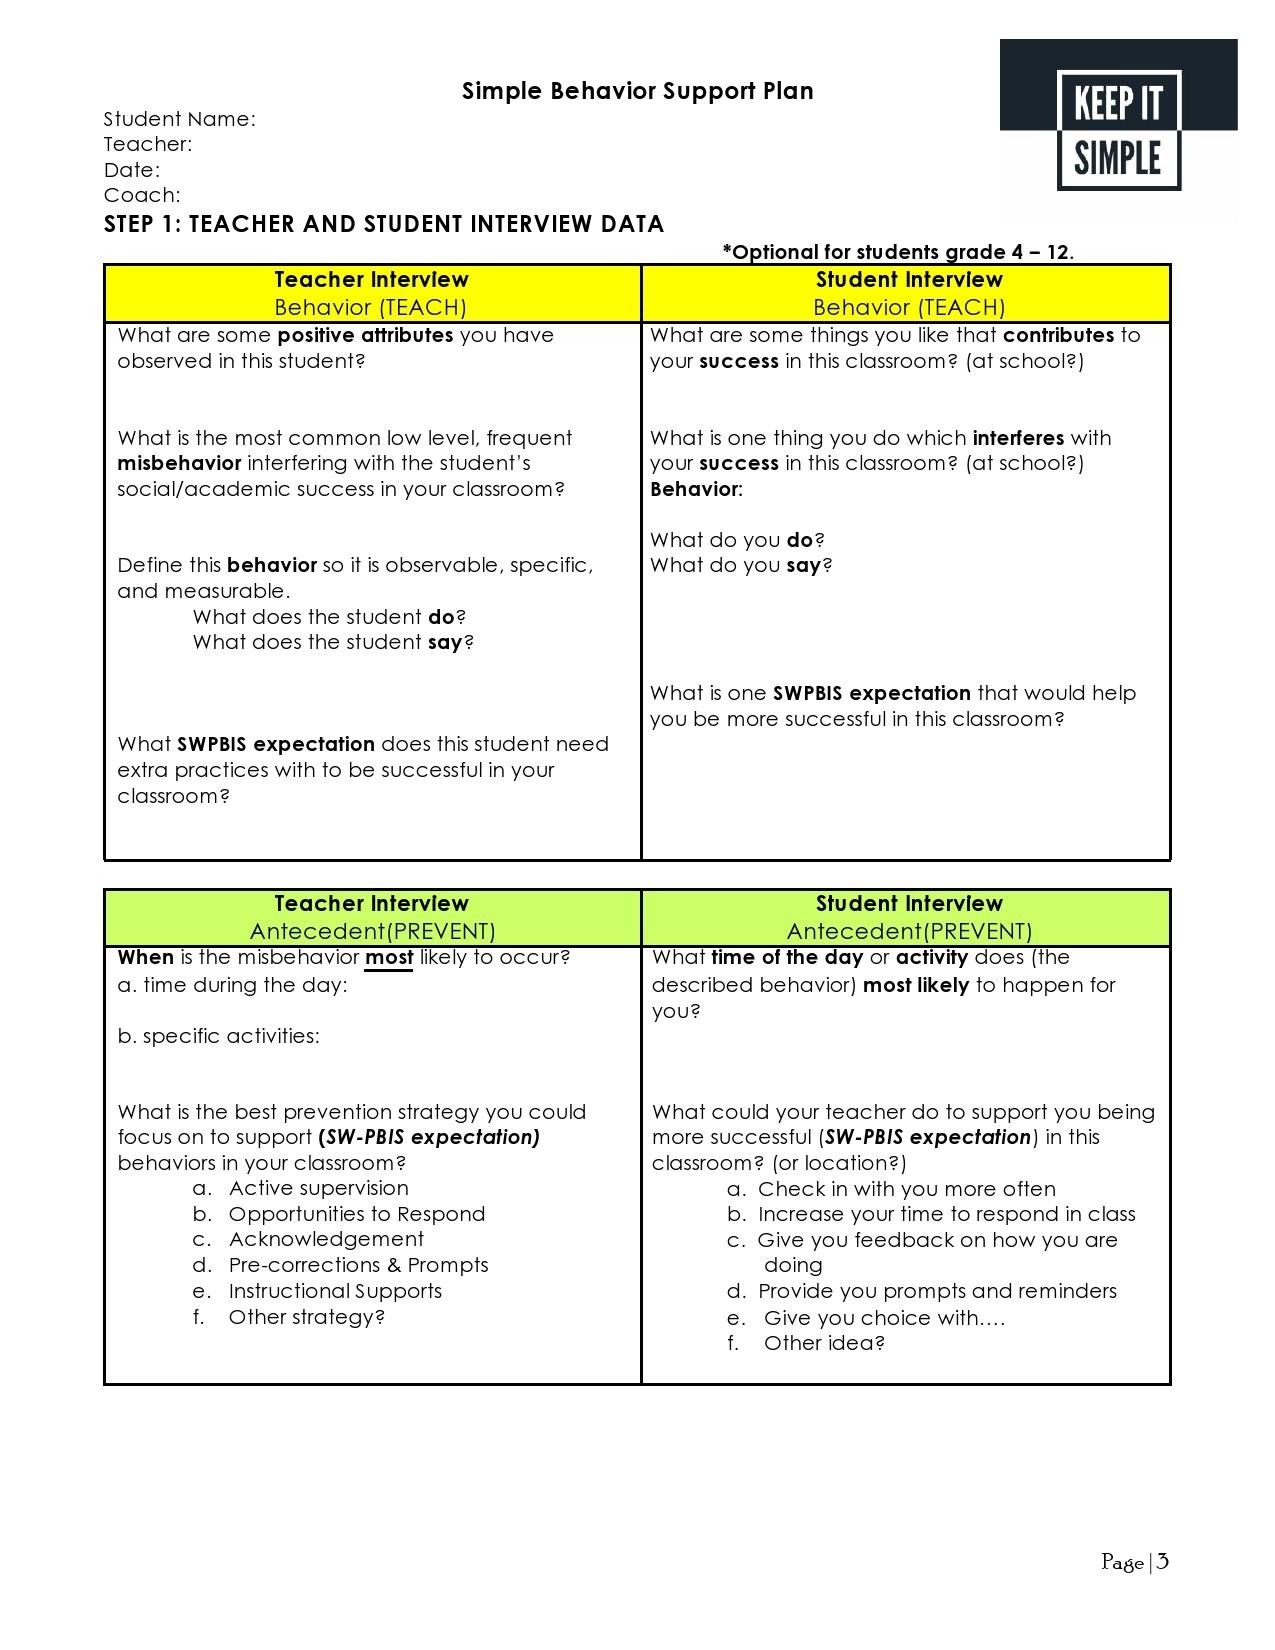 Free behavior plan template 43